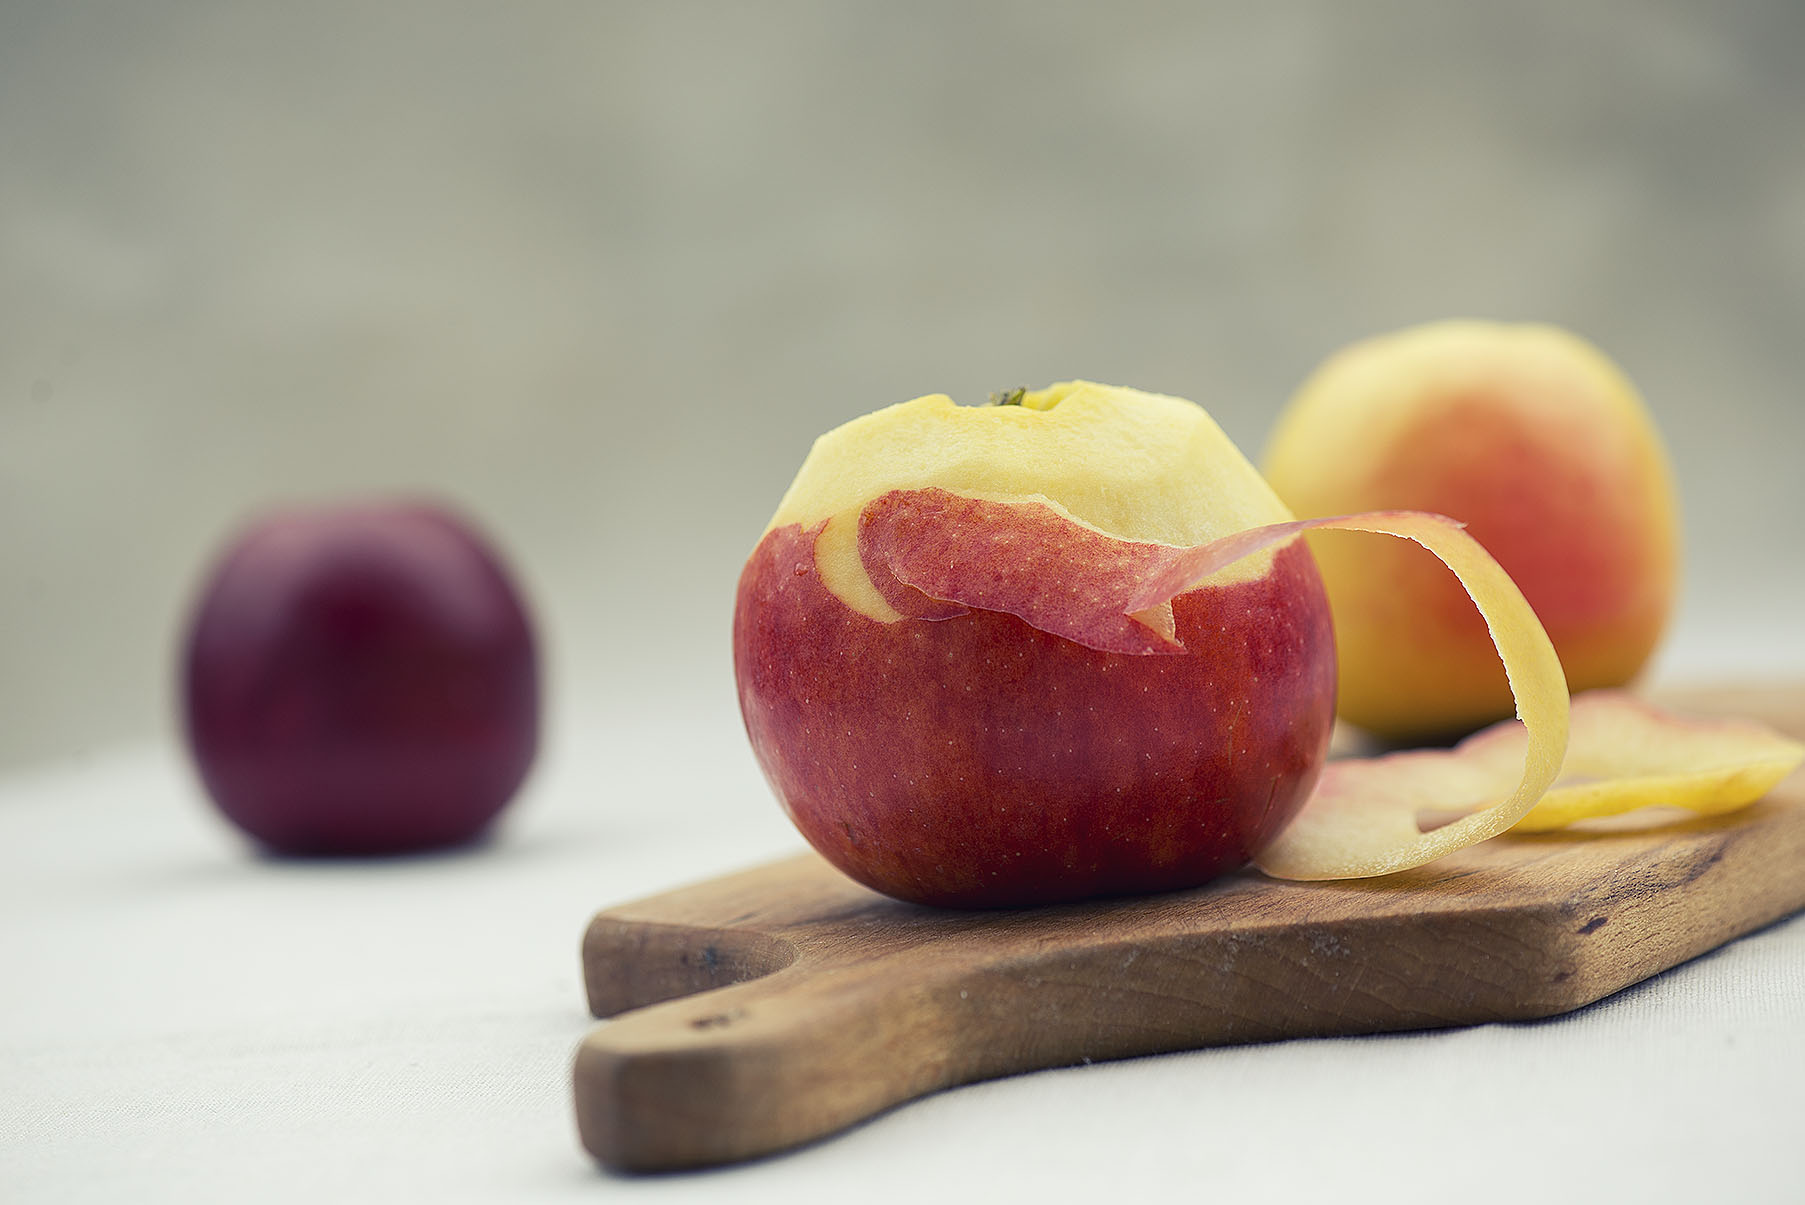 AGN_strudel jabłkowy008-Edit